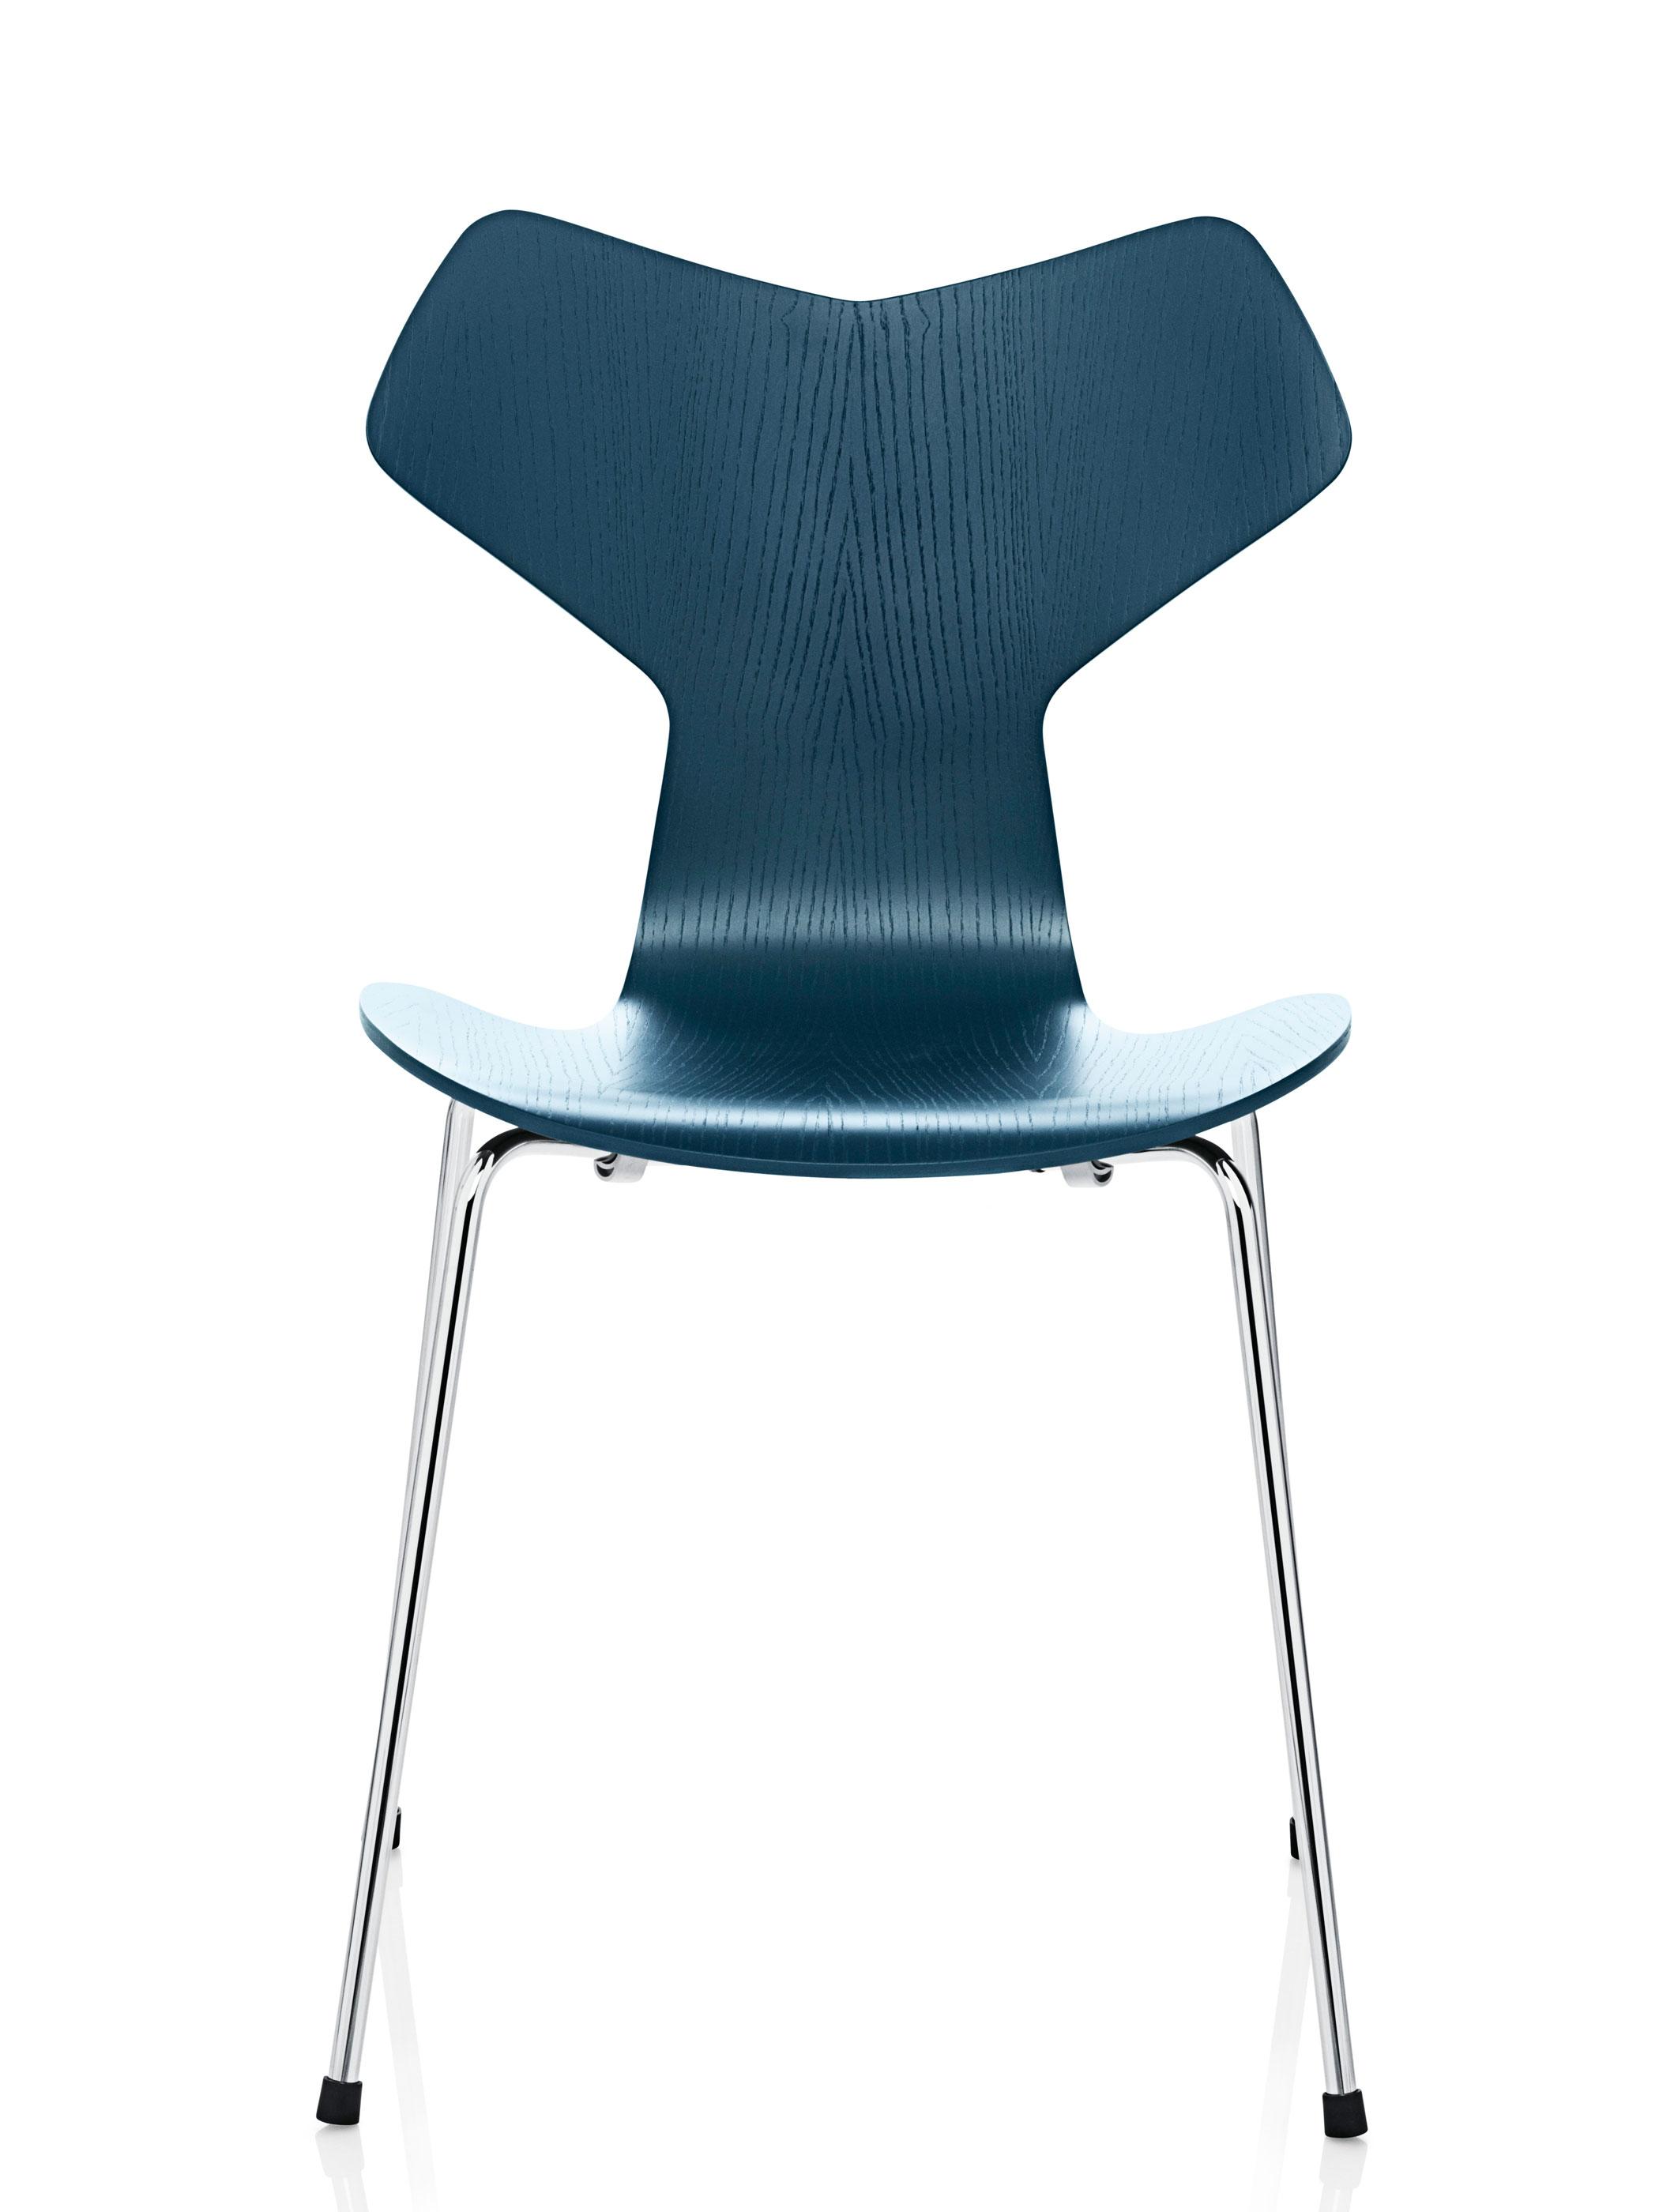 fritz hansen grand prix 3130 gef rbte esche petrol blau produktdetails. Black Bedroom Furniture Sets. Home Design Ideas